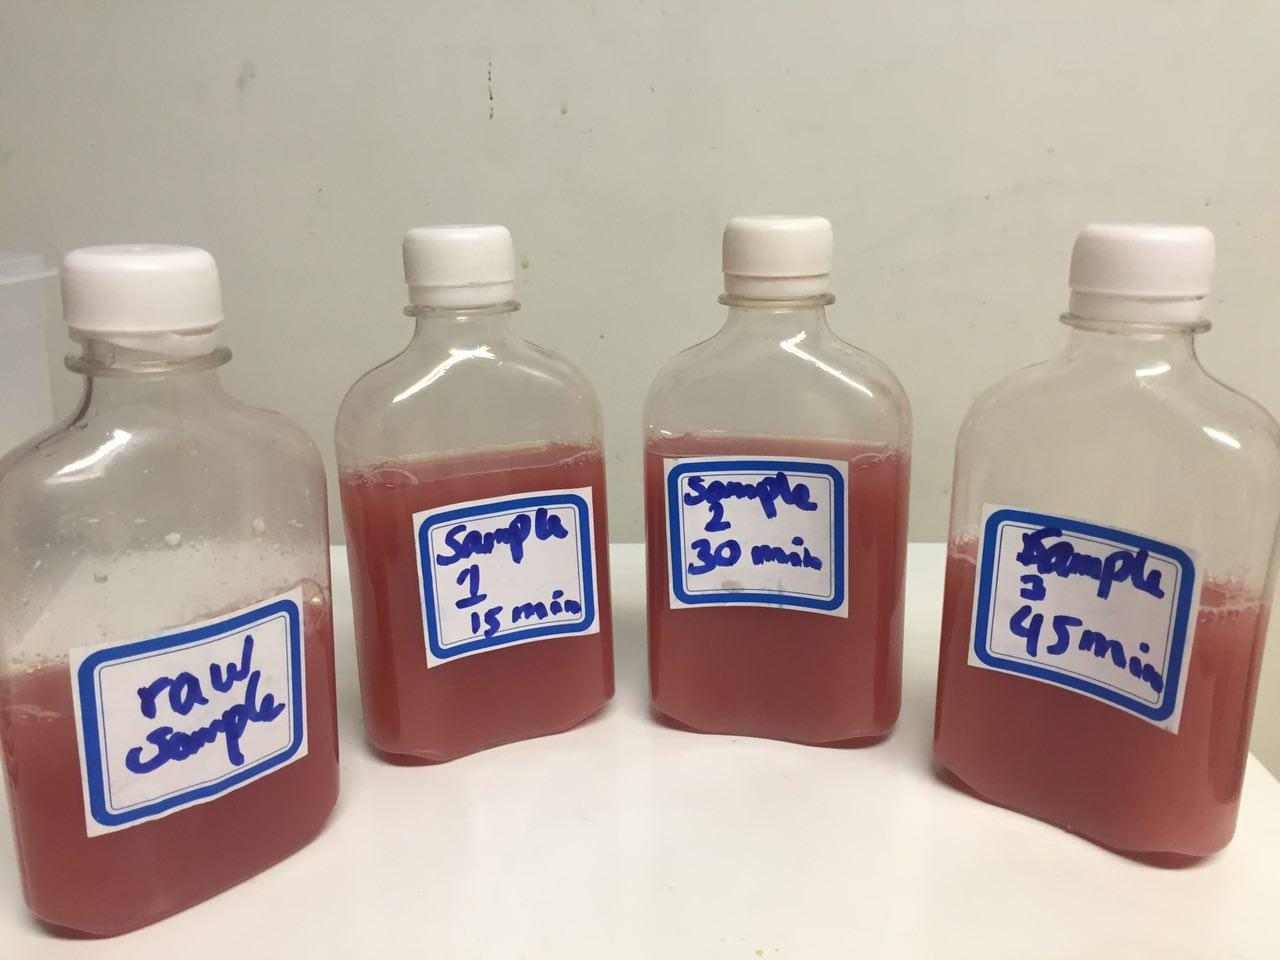 Watermelon non-thermal pasteurization